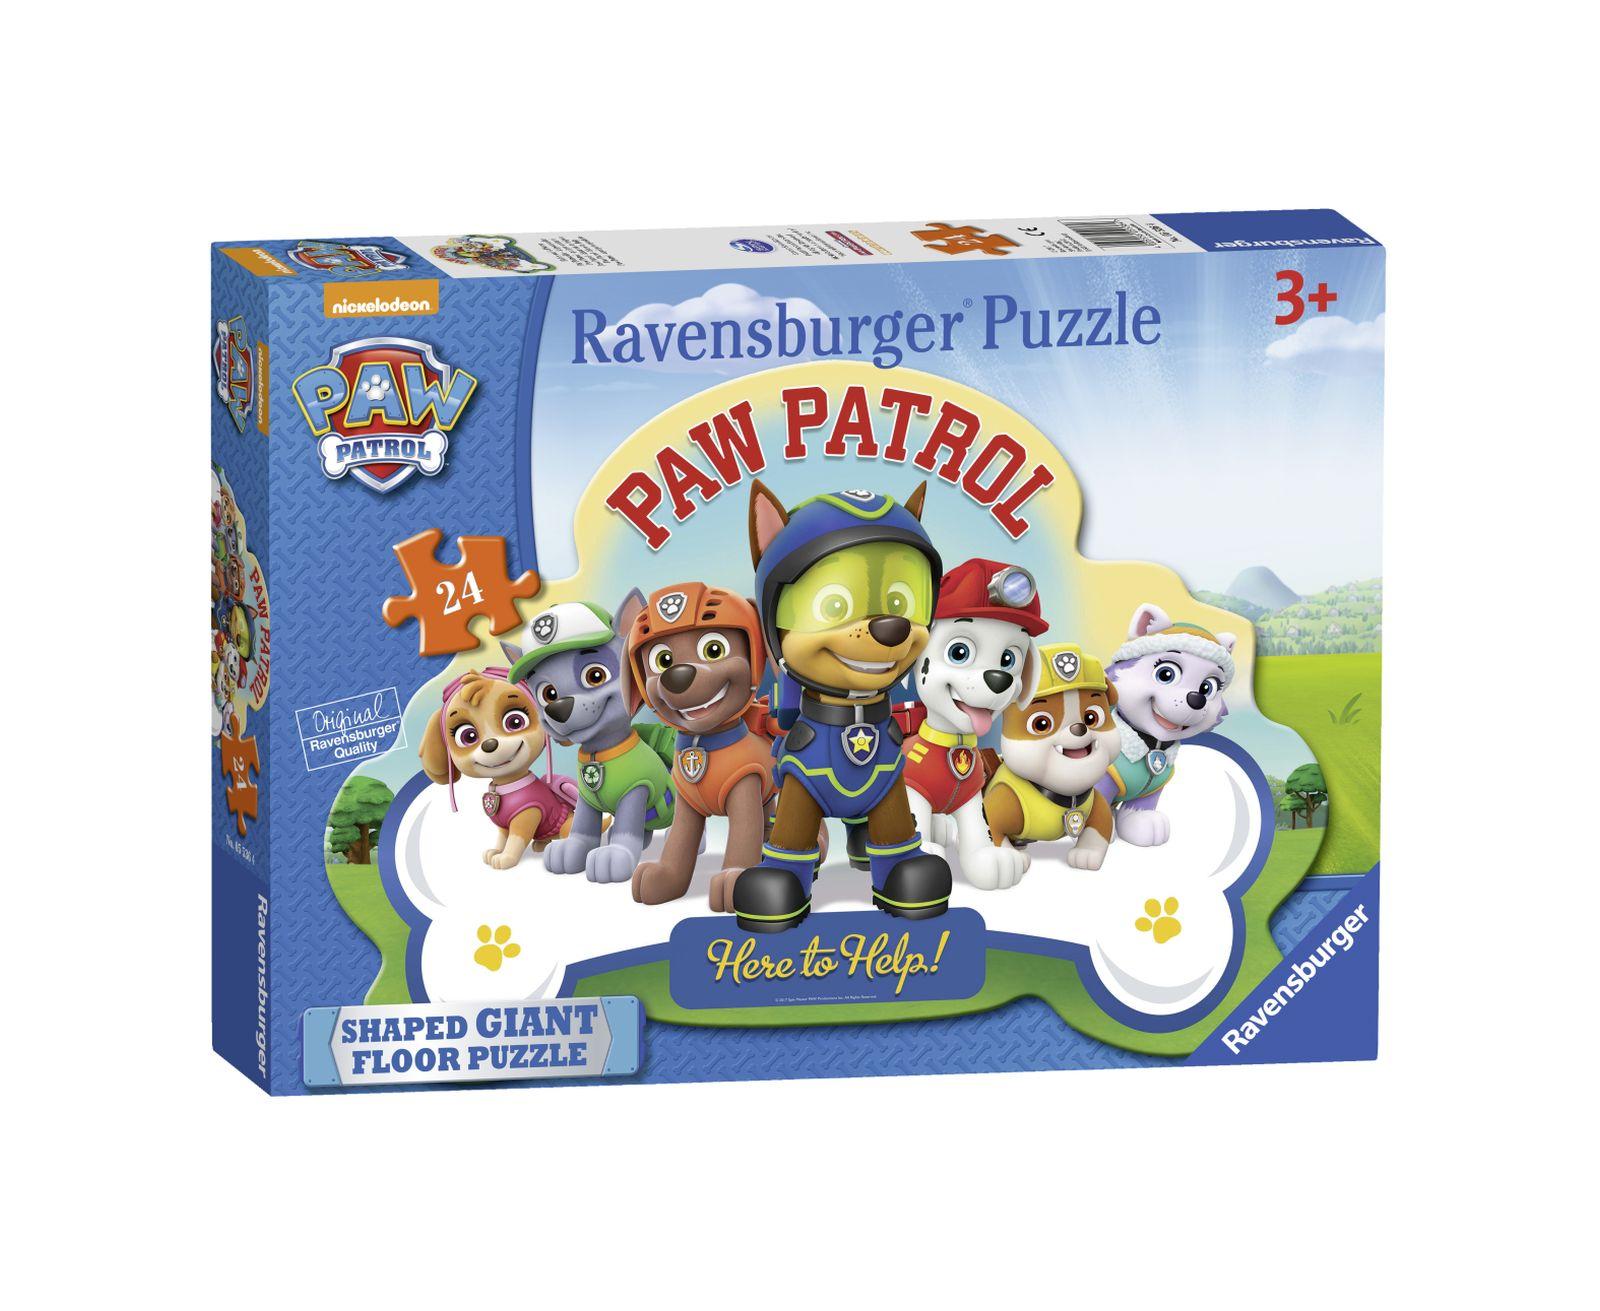 Ravensburger puzzle 24 giant pavimento - paw patrol - Ravensburger1